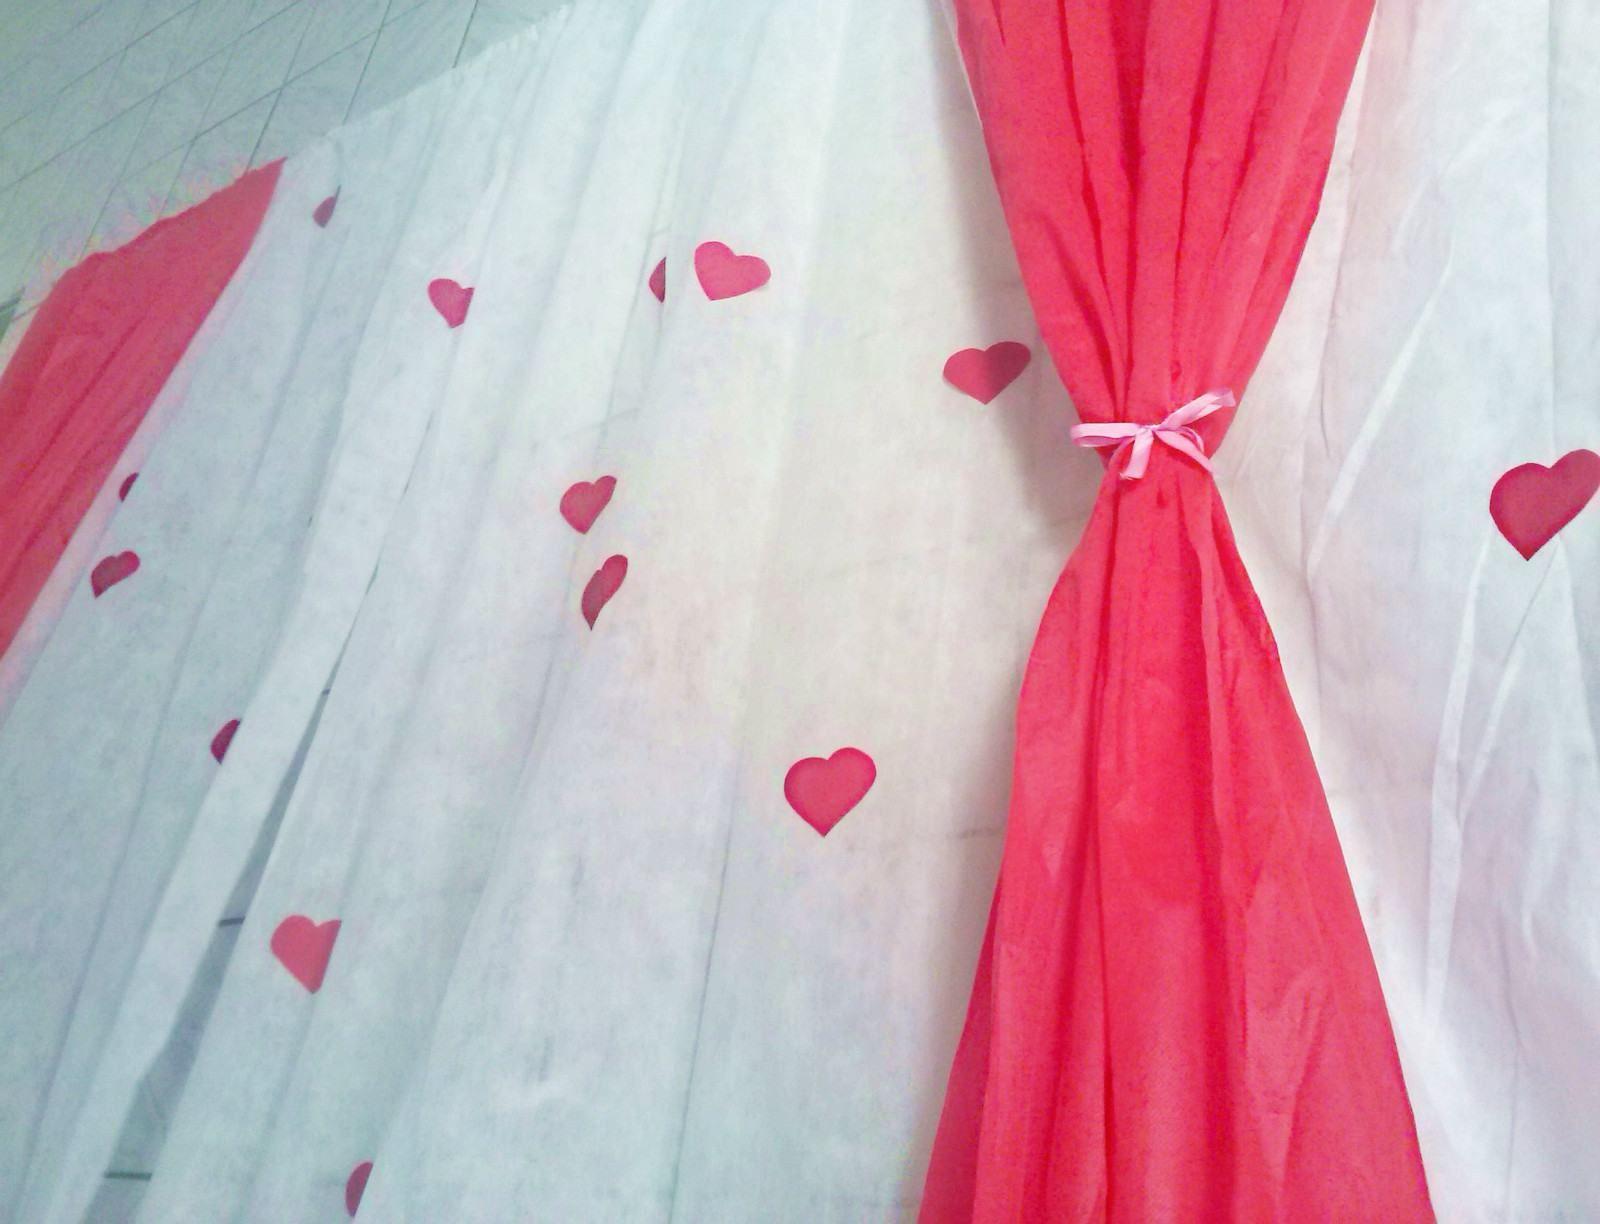 Cortina De Tnt Para Festa Decorativas Jpg 1600 1224 Casamento